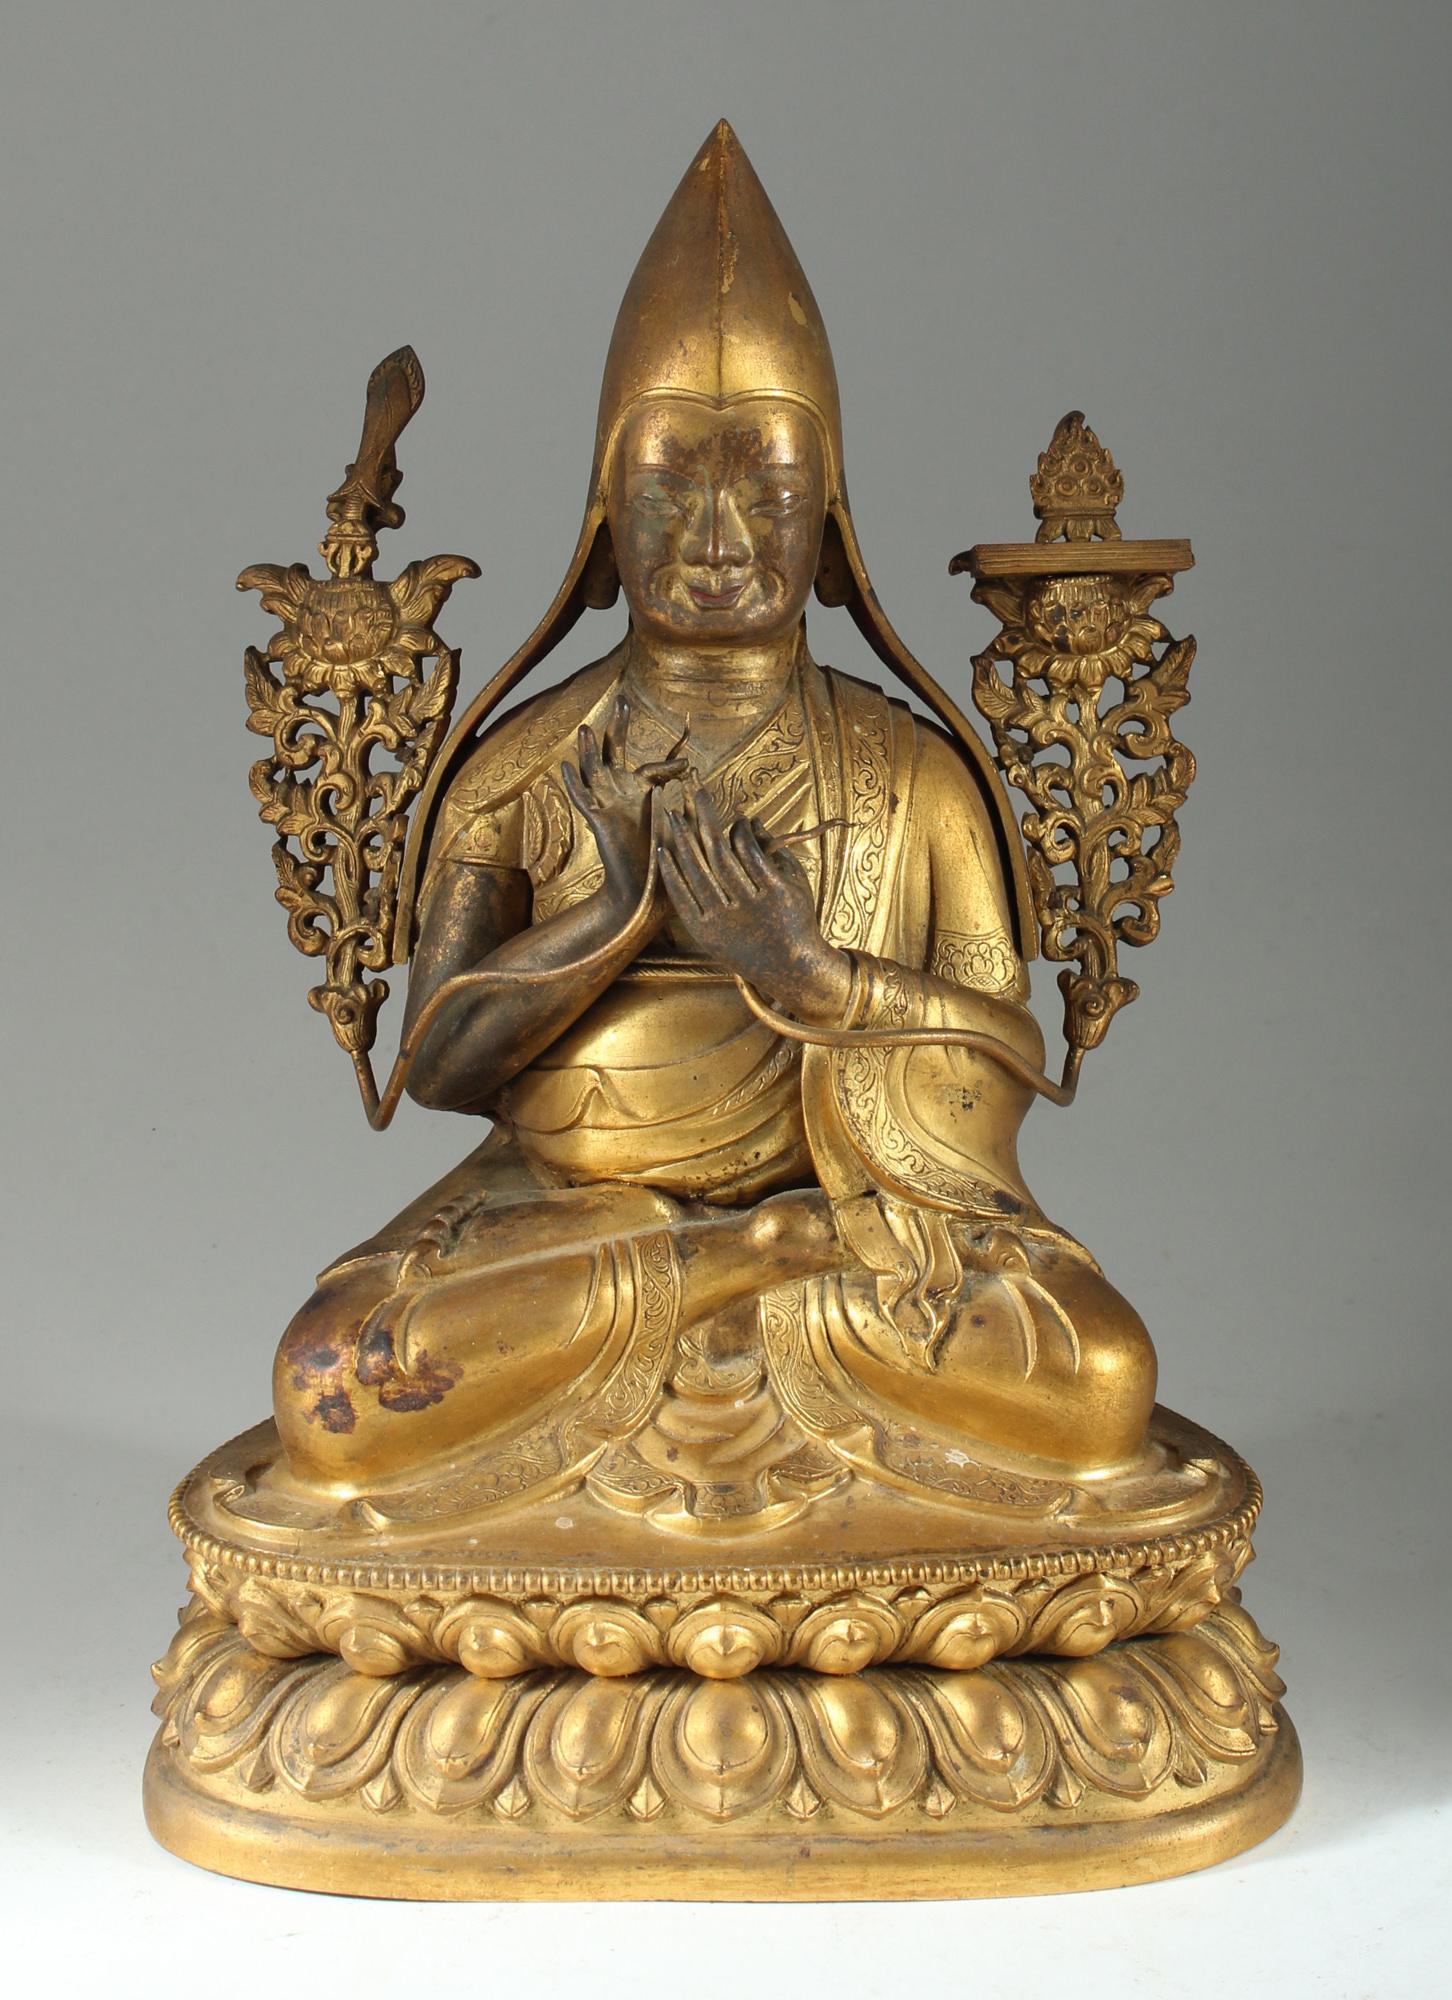 Tibetan Gilt Bronze Figure of Tsongkhapa Asian Art Manjushri Monasticism Gelug, New York Auction House, Houston Auction, Dallas Auction, San Antonio Auction, Chinese Auction, 中国艺术拍卖, 西藏艺术, 宗喀巴, 坐像,  铜鎏佛像, 海外捡漏